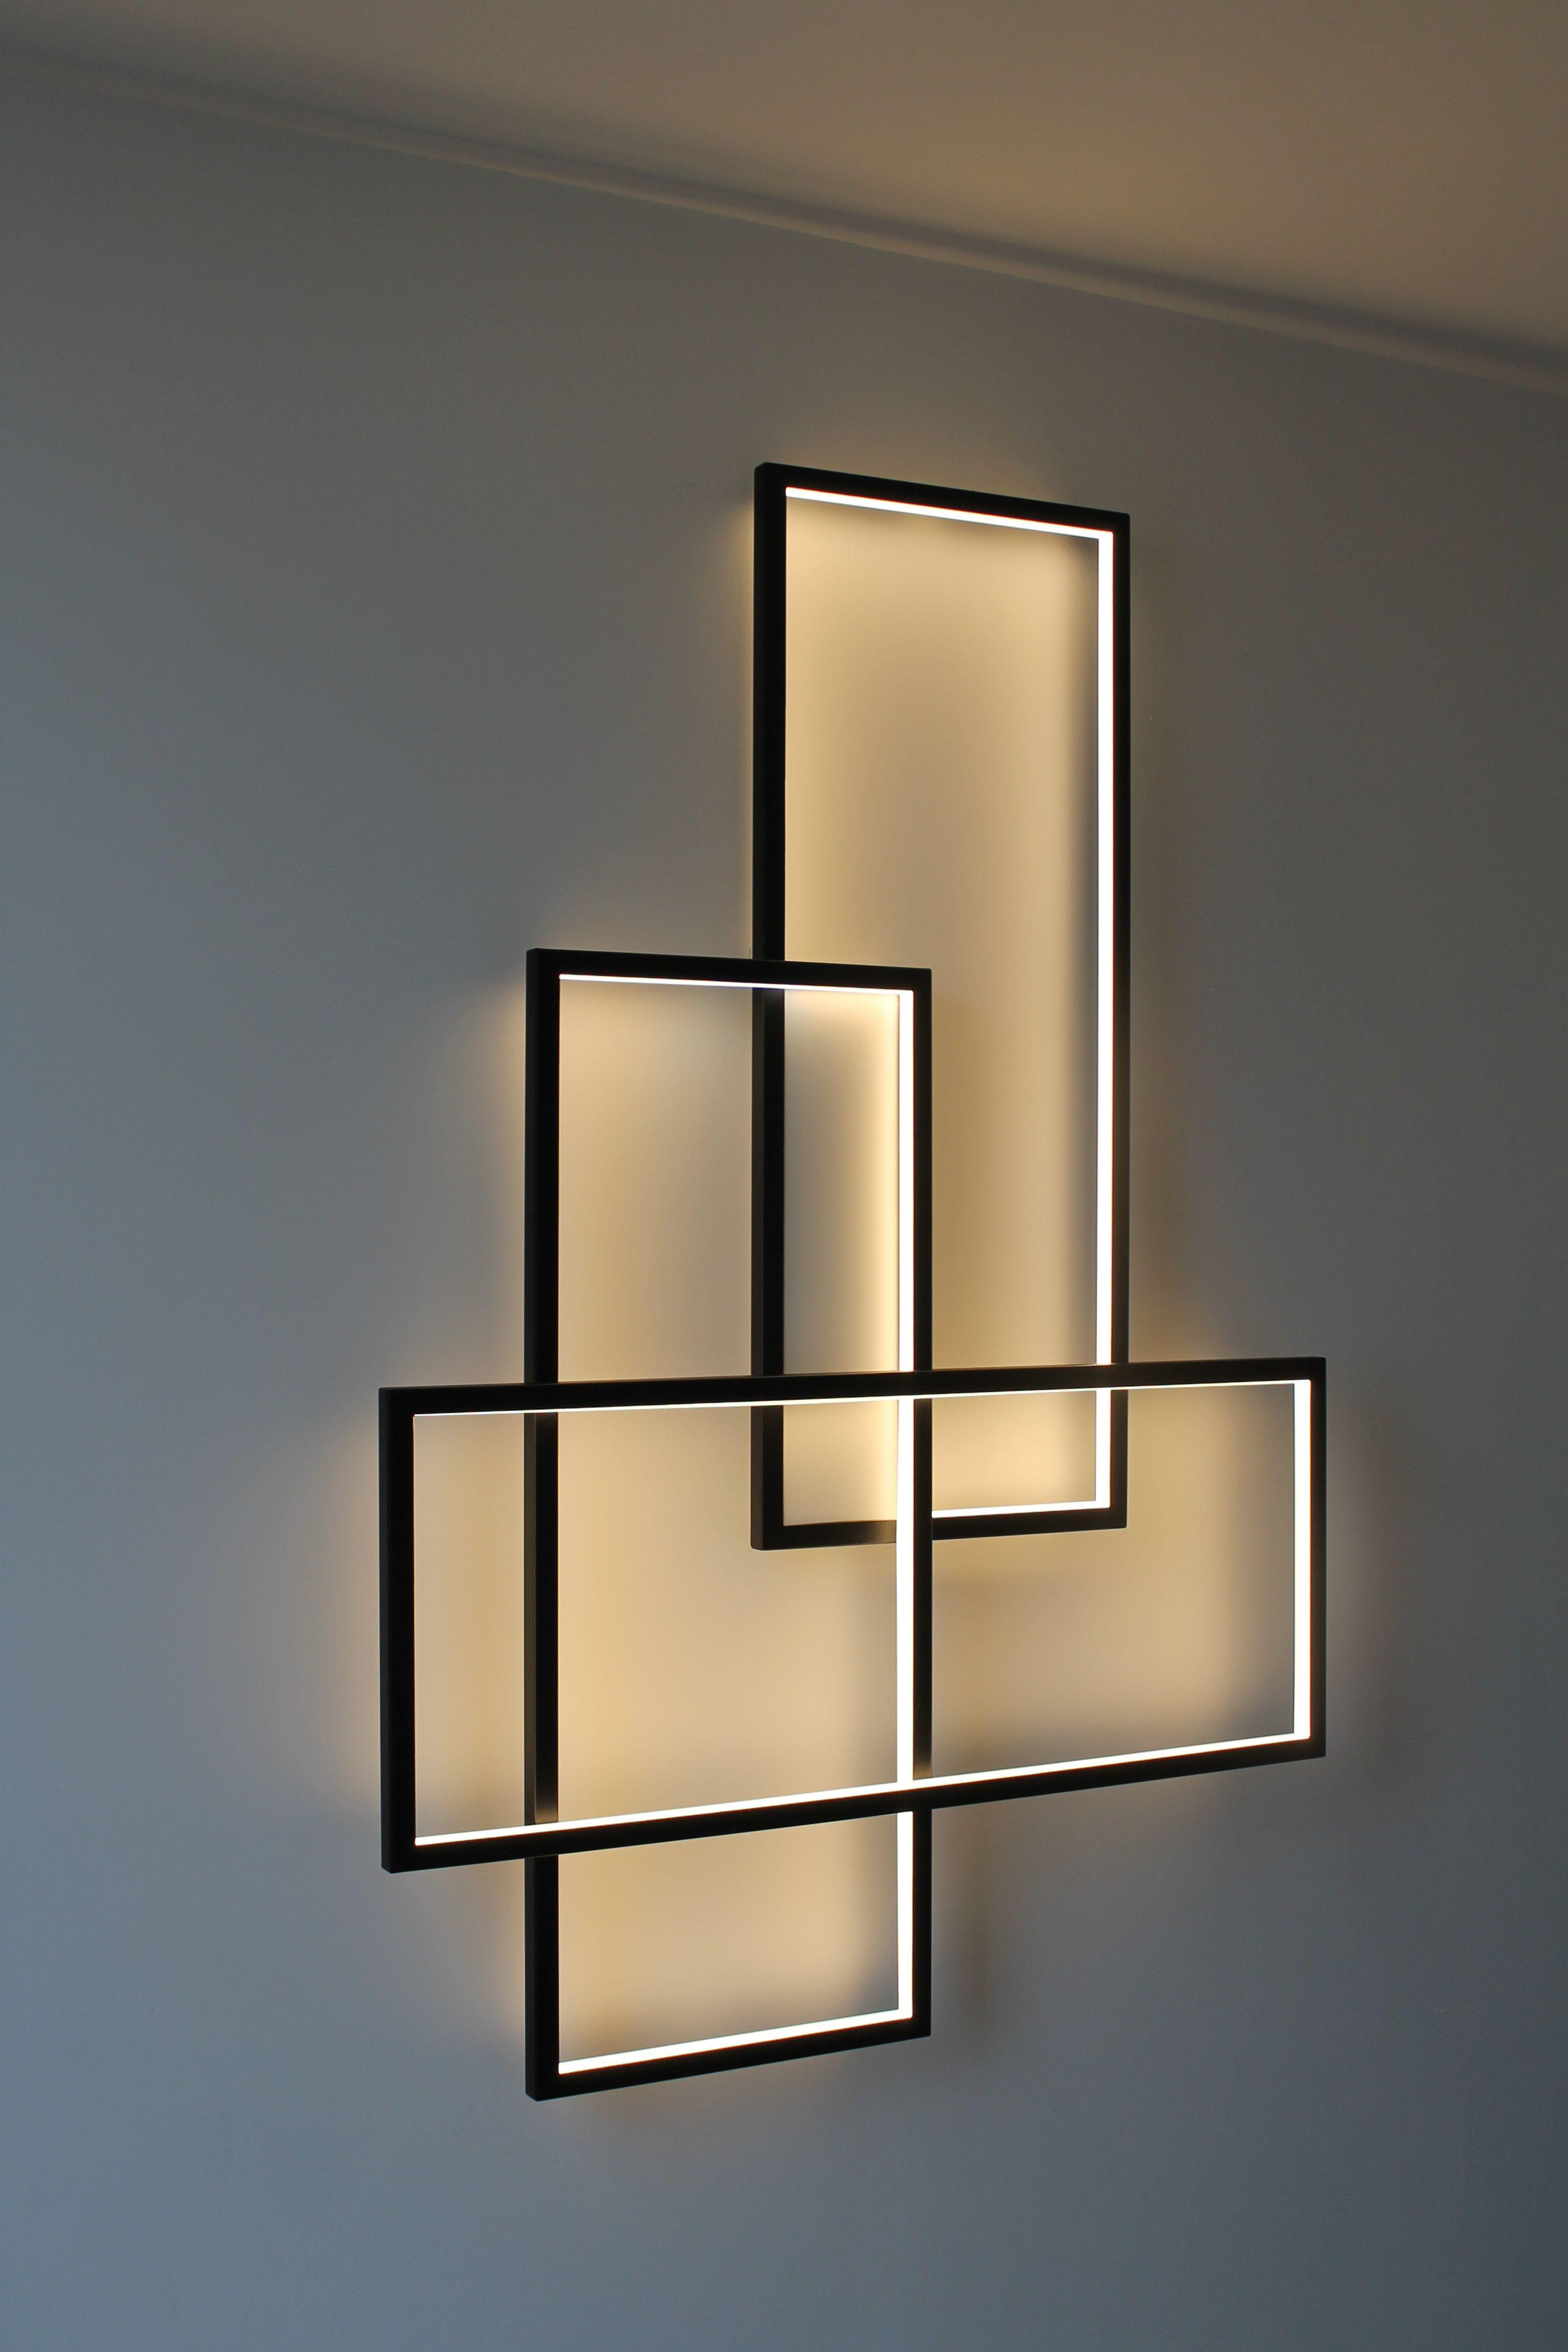 contemporary floor modern designer hanging light imagination top fixtures living lighting table lamps for room brilliant